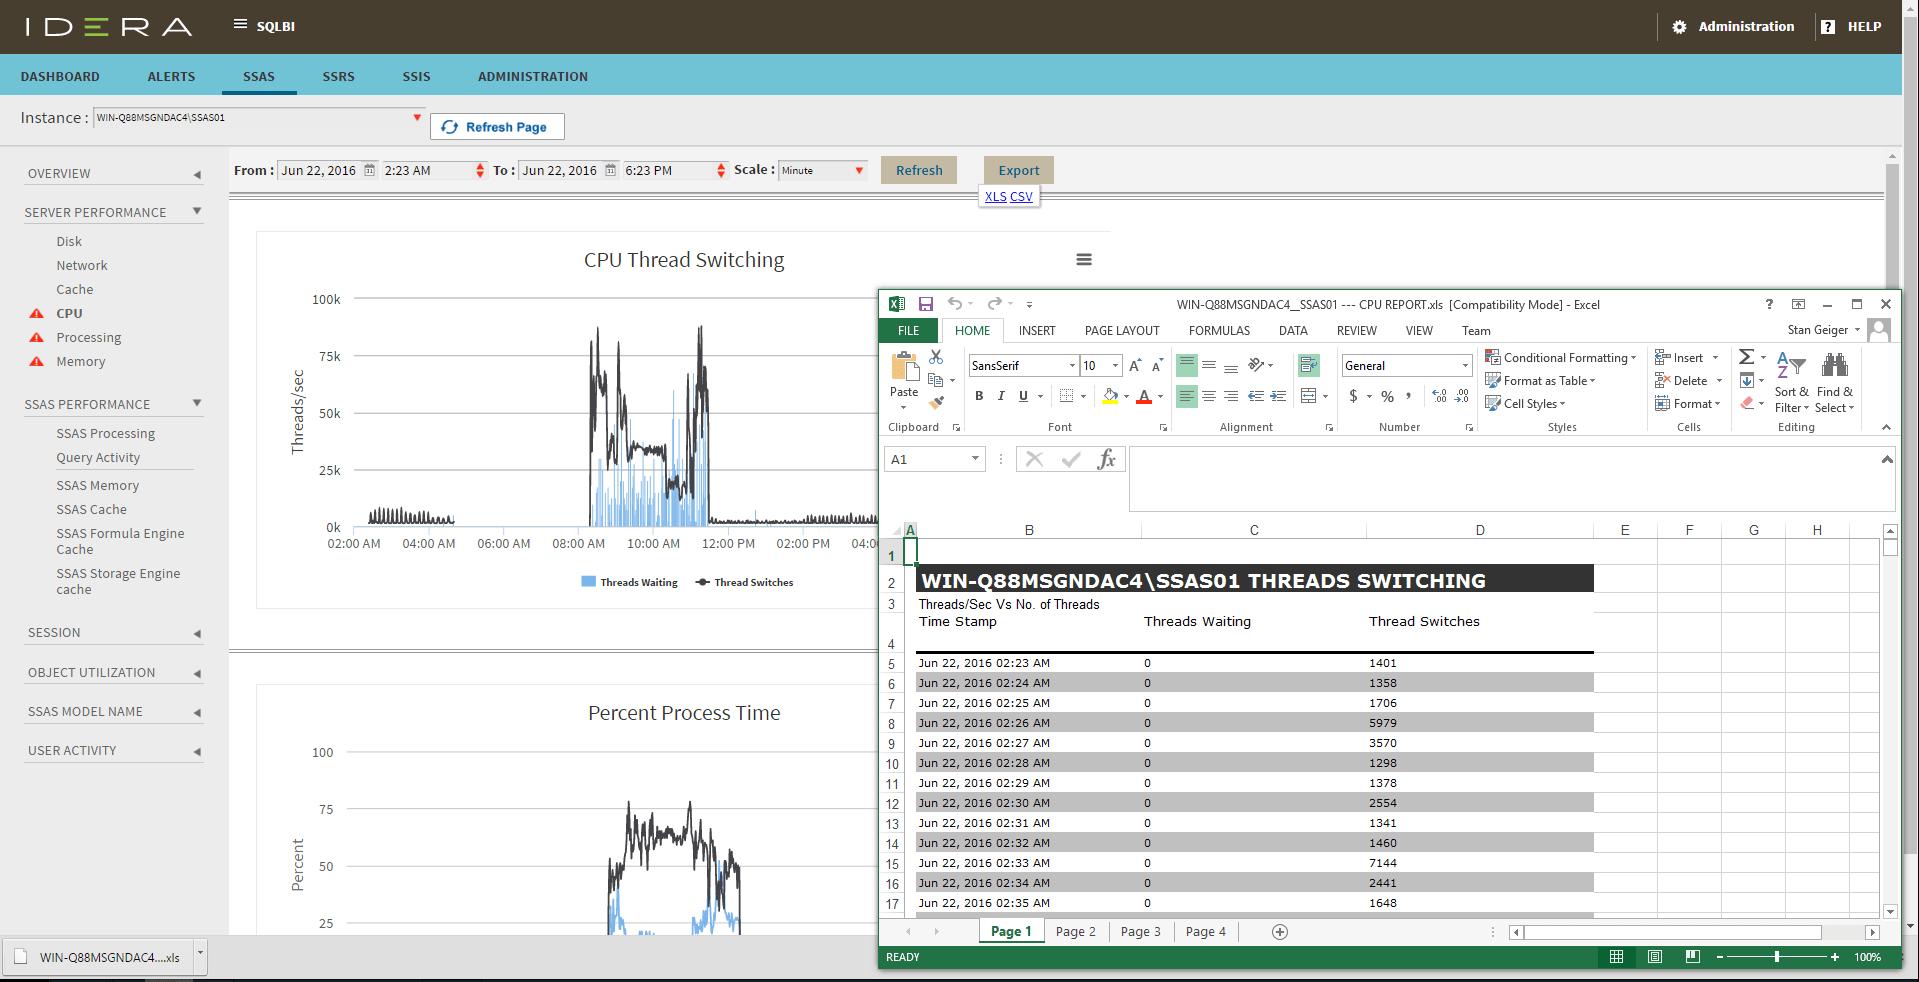 IDERA SQL Pack